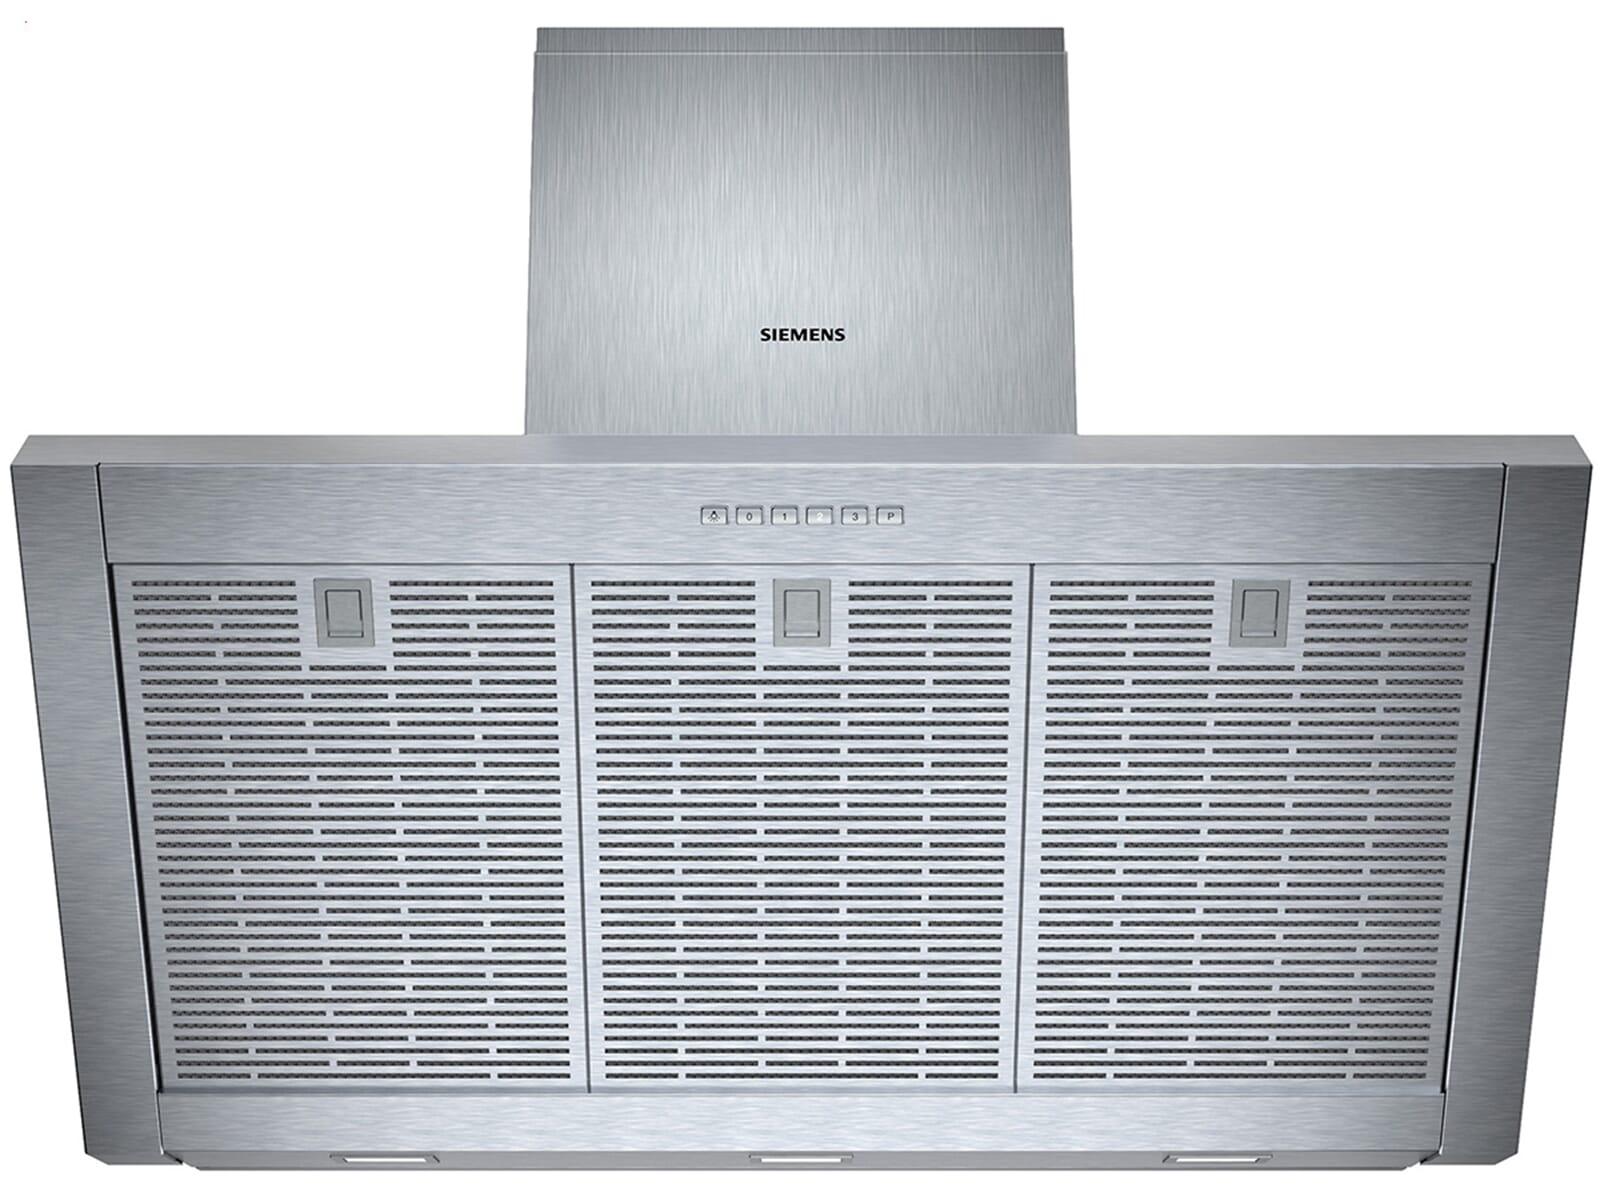 Siemens lc97ka532 kopffreihaube edelstahl ebay